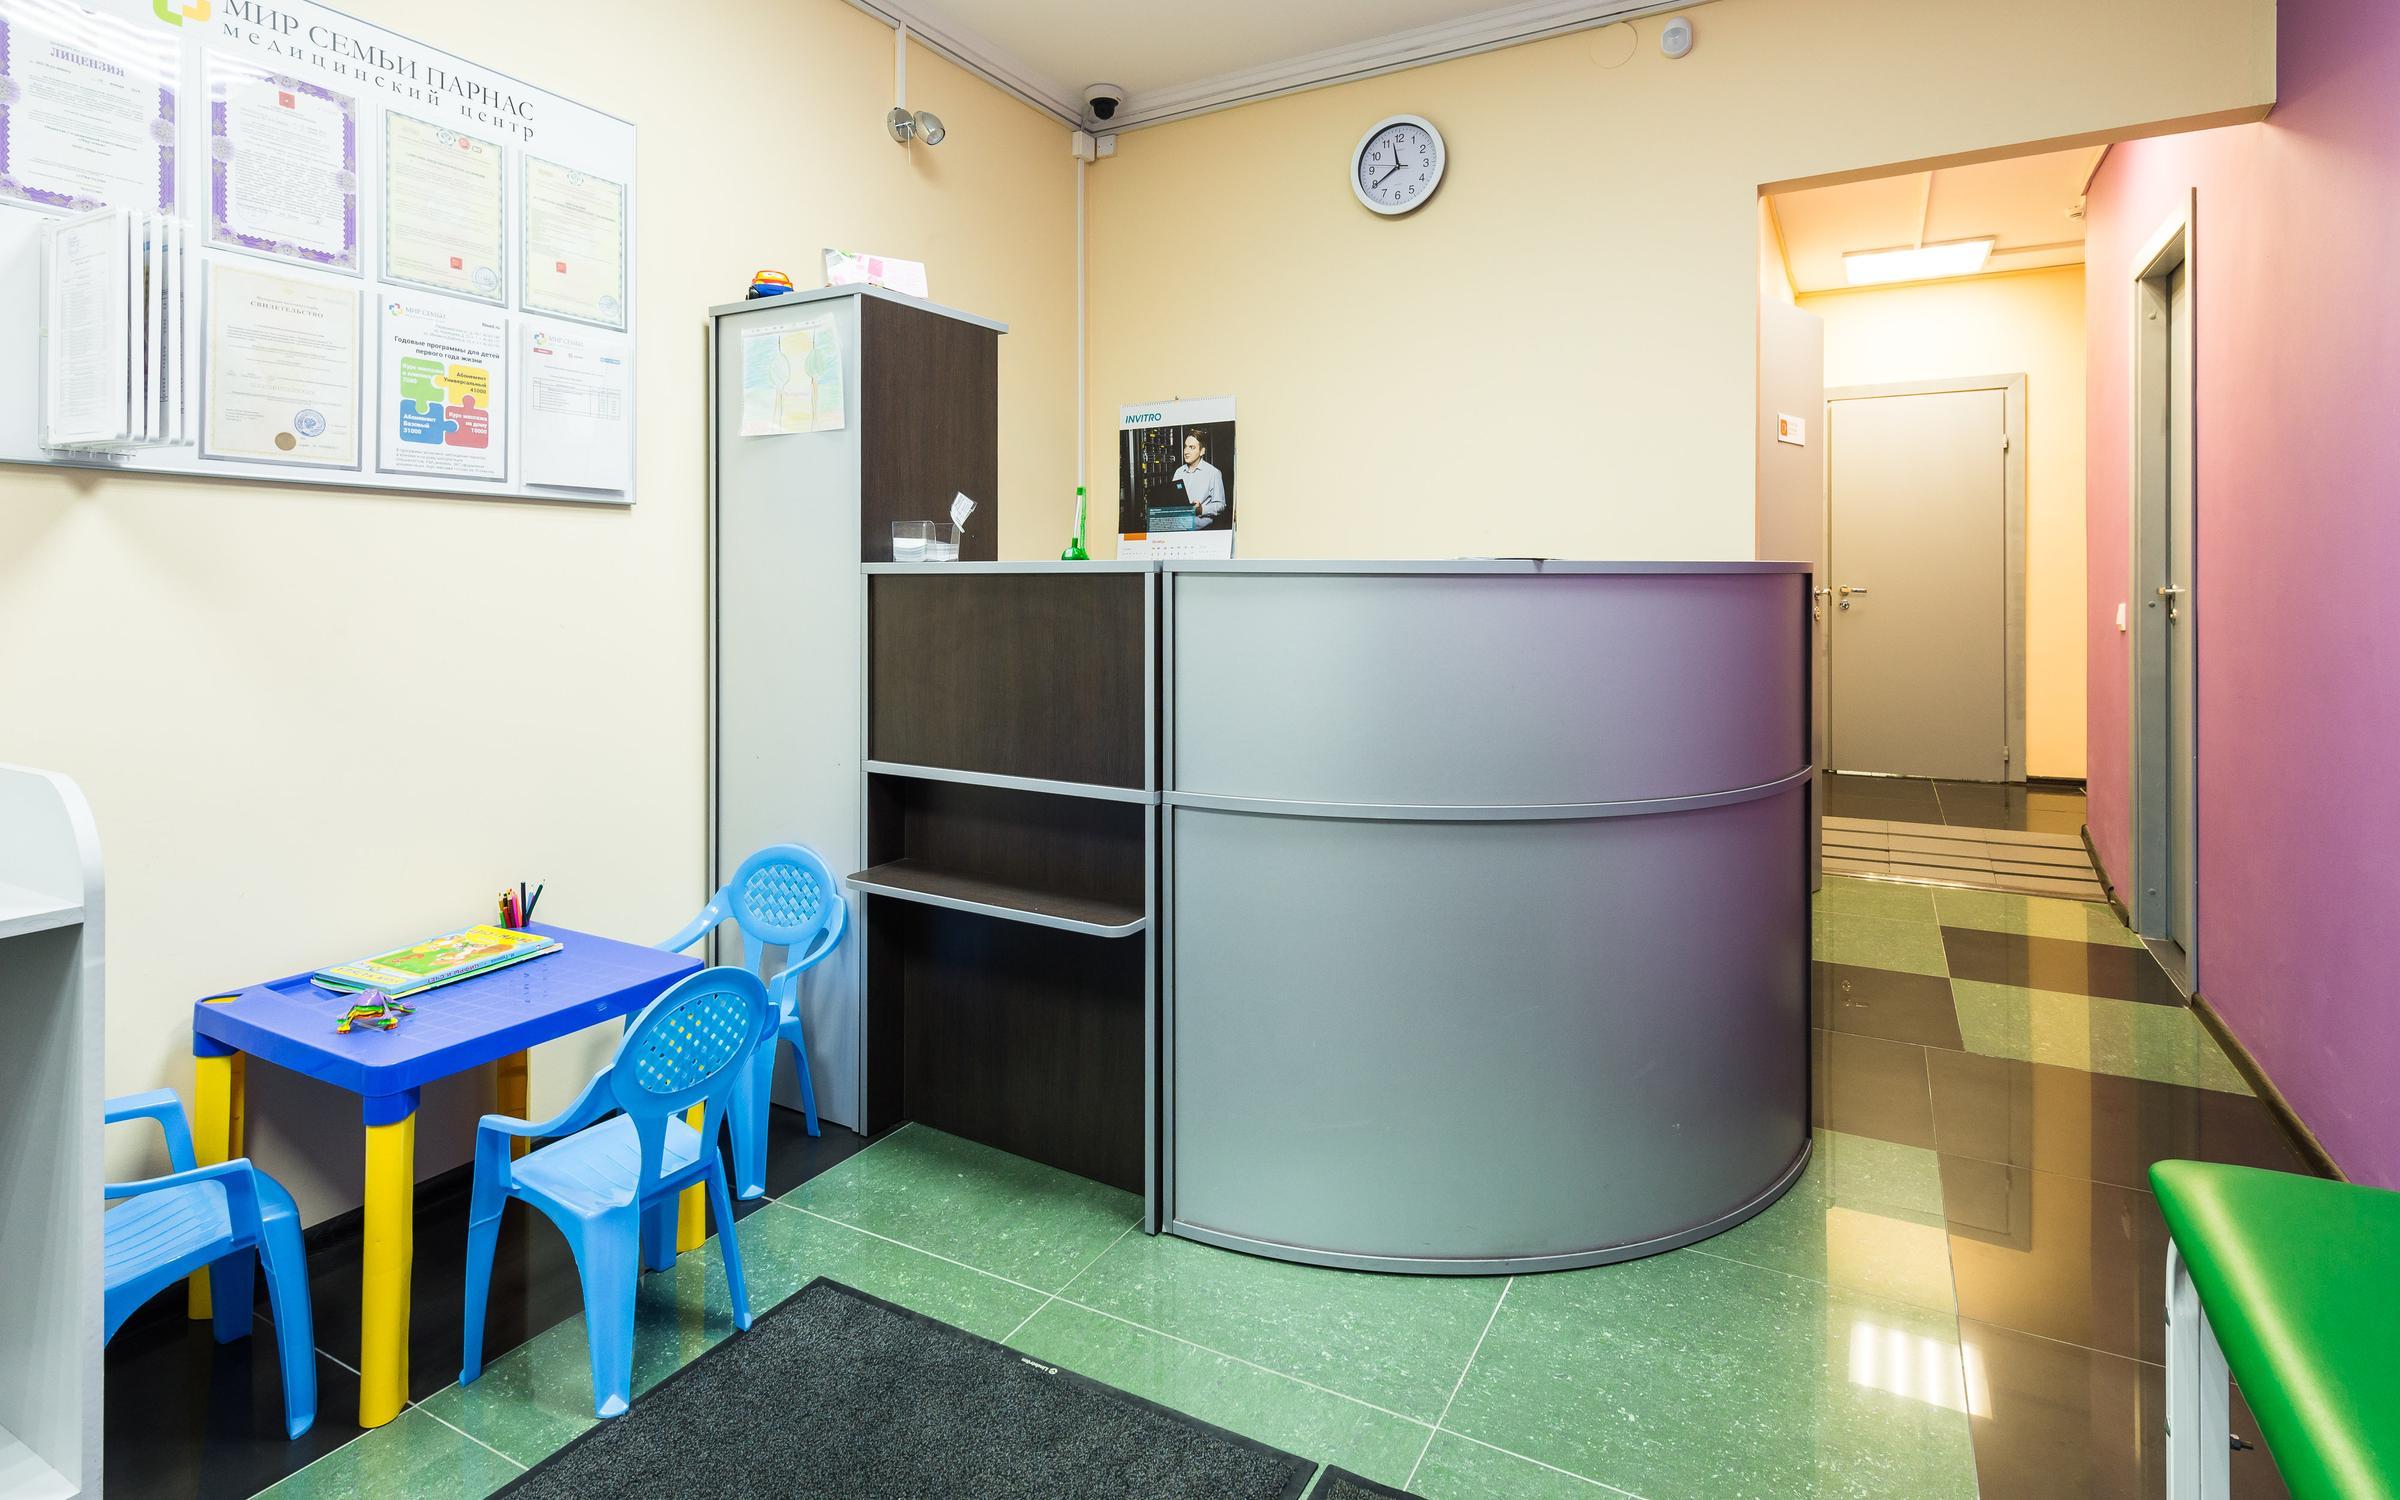 фотография Медицинского центра Мир семьи на метро Парнас